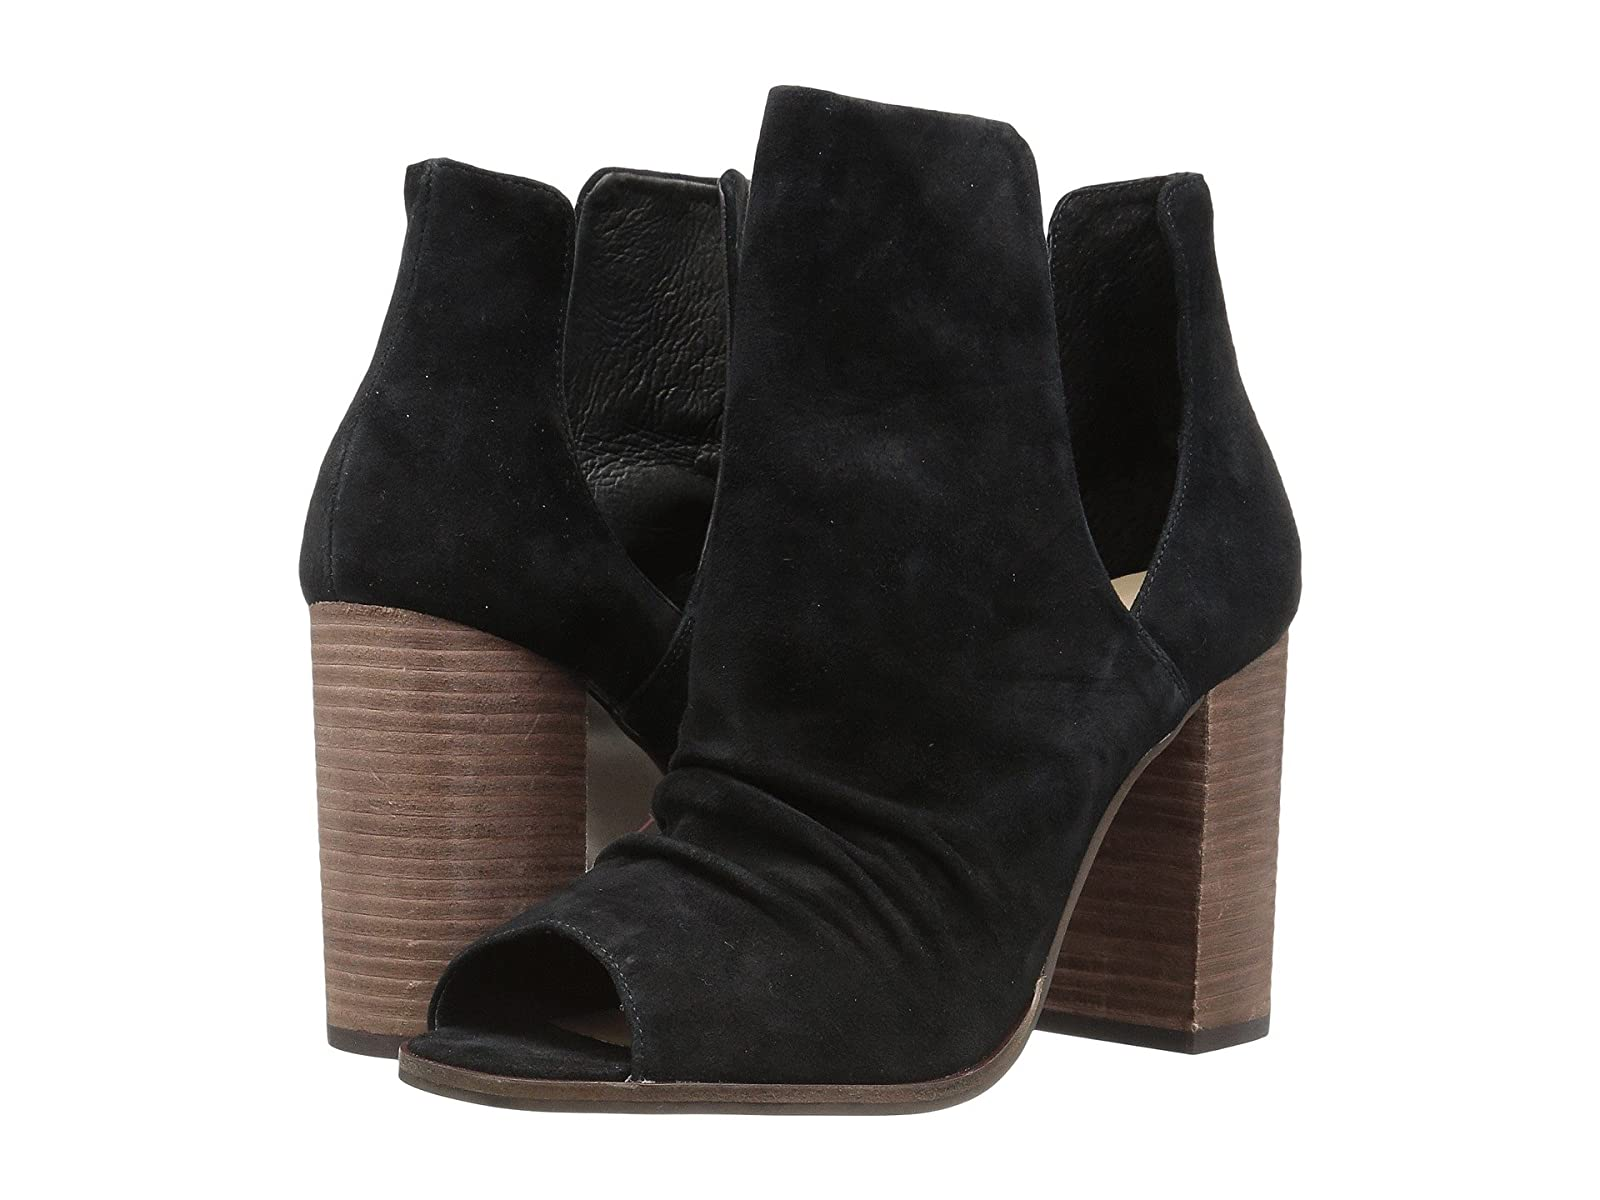 Kristin Cavallari Lash Peep Toe BootieAffordable and distinctive shoes